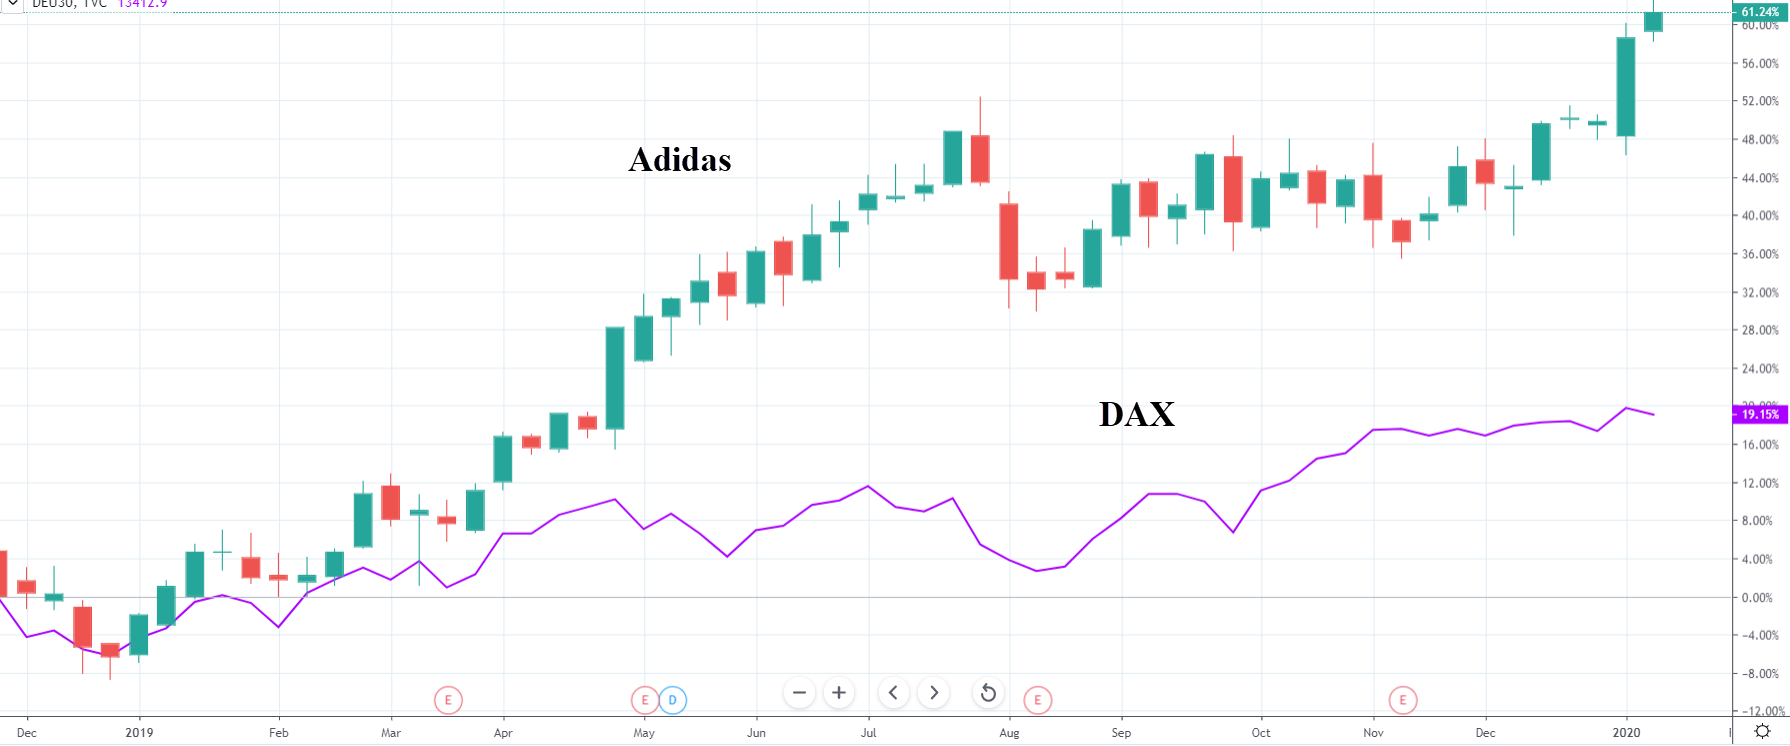 Akcie Adidas vs DAX